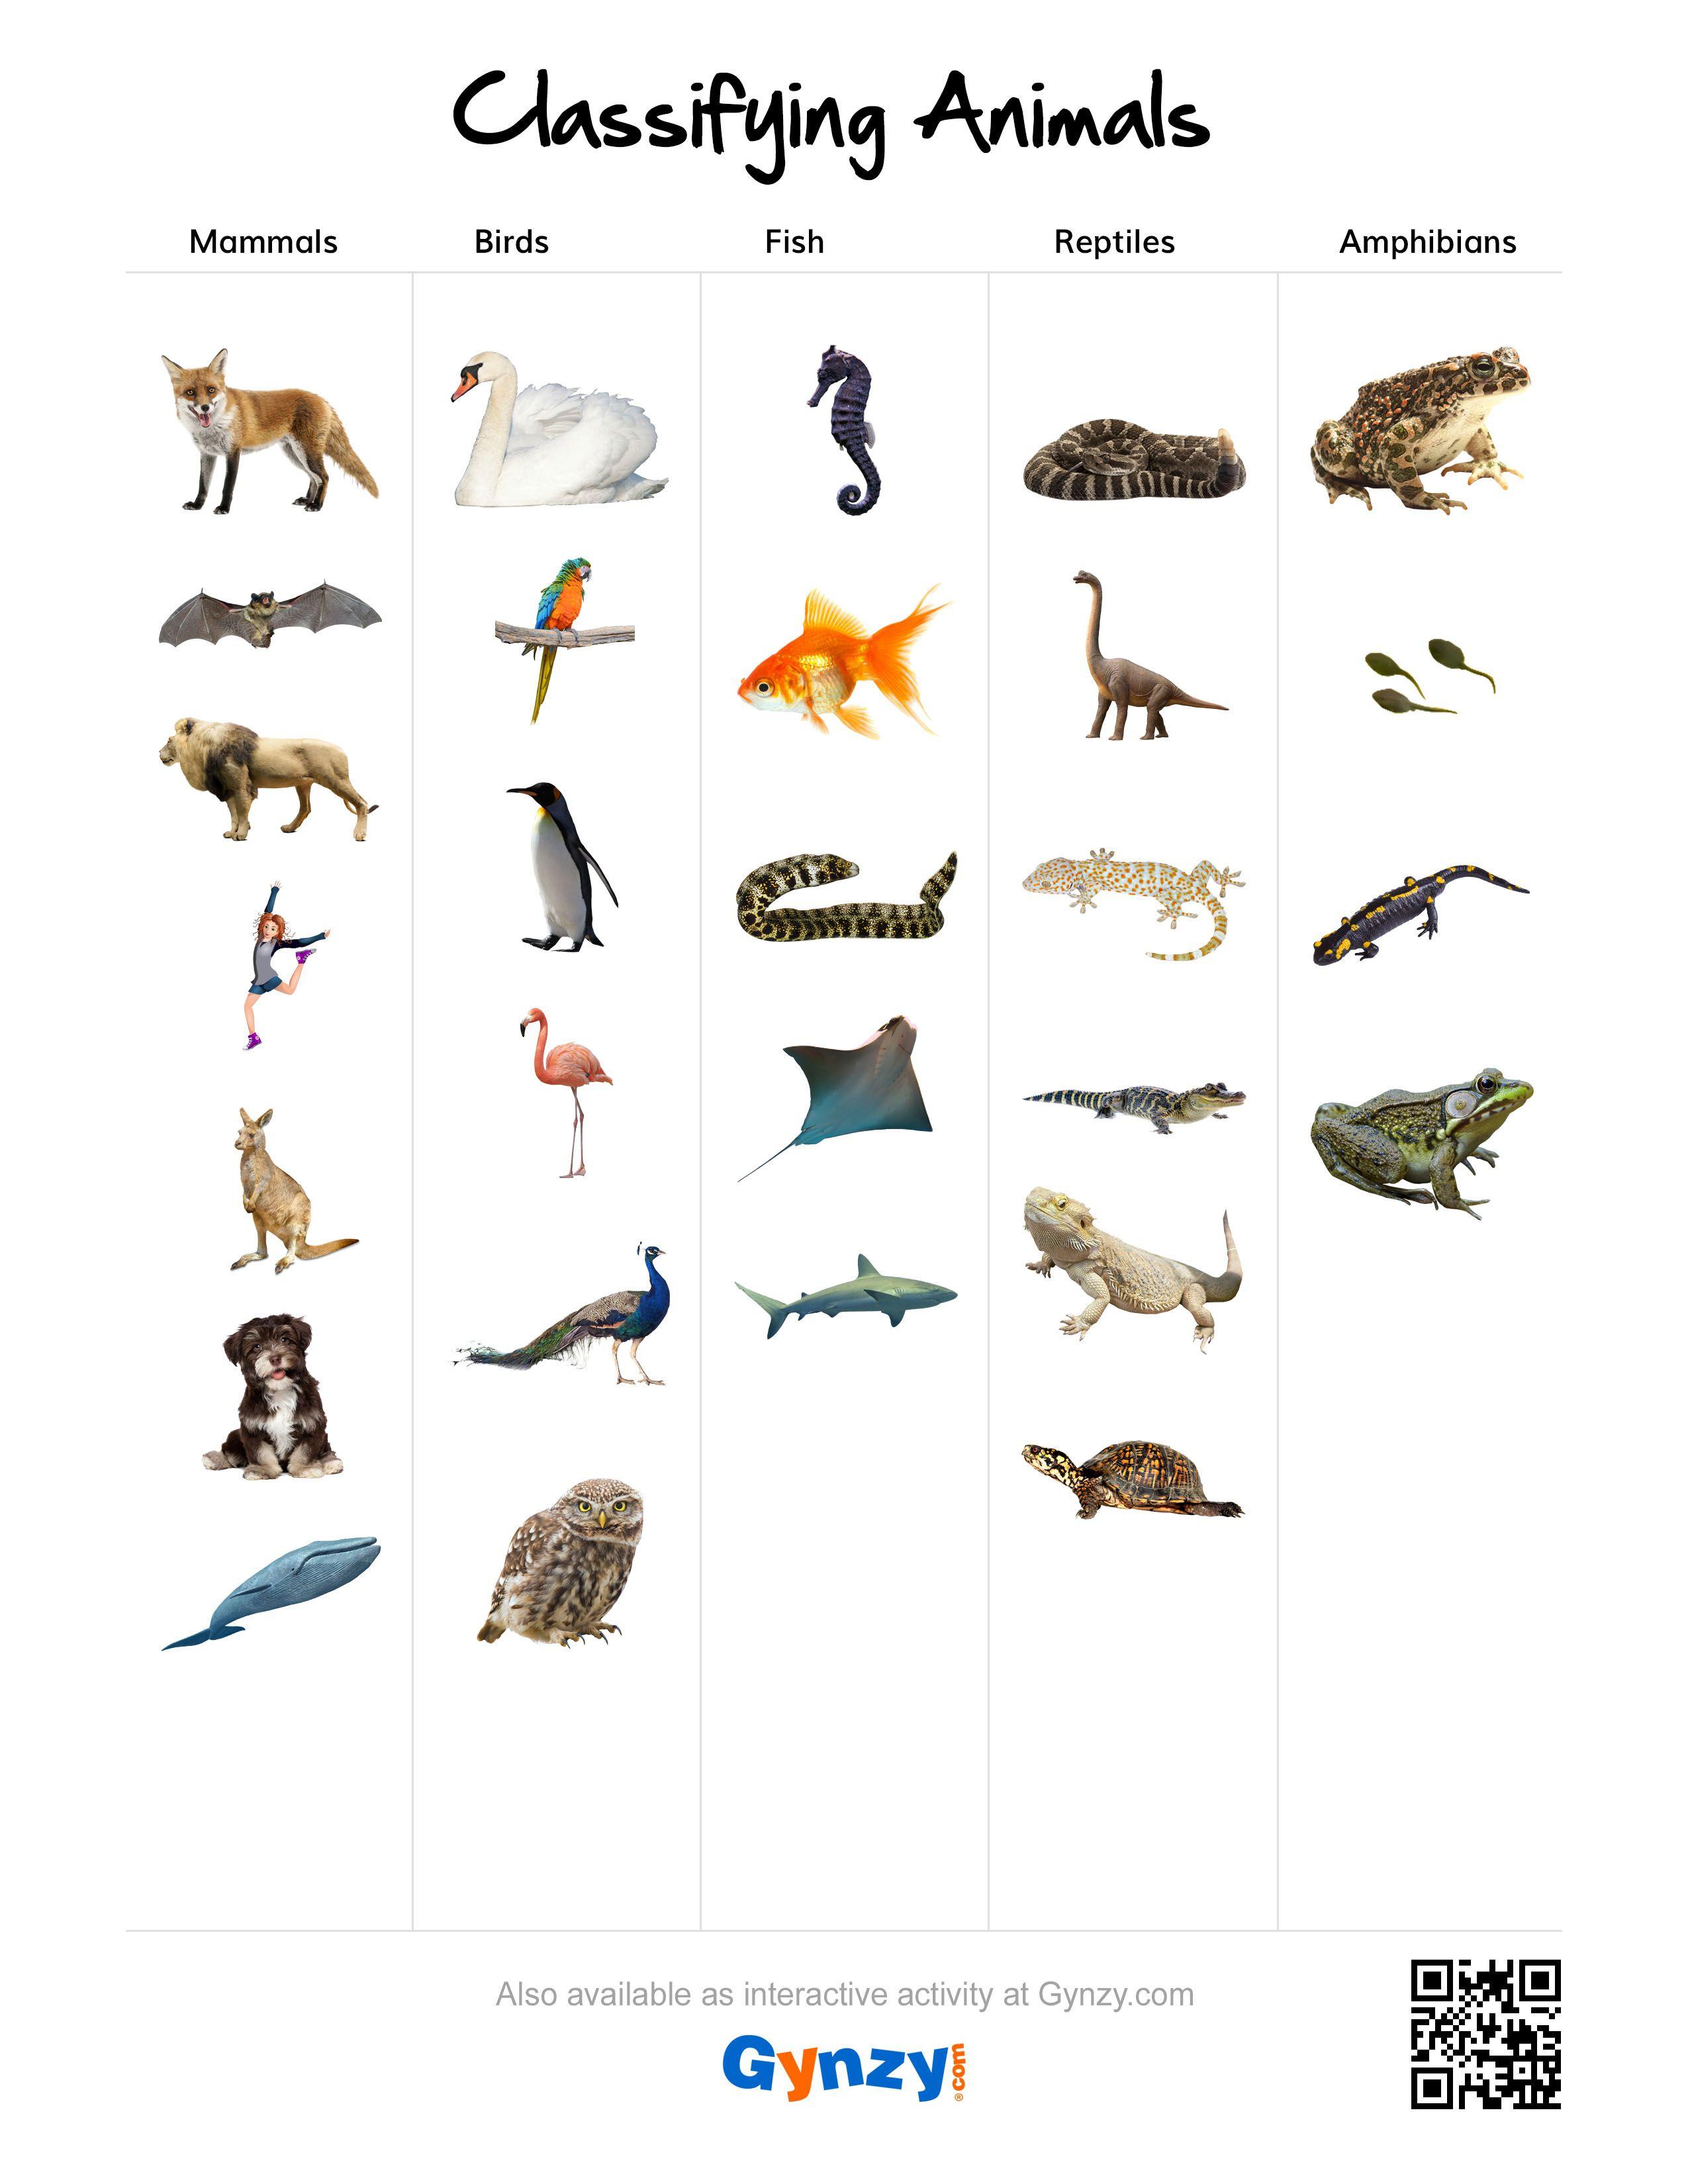 Mammals Birds Fish Reptiles Or Amphibians S Rnzy 285e12fa